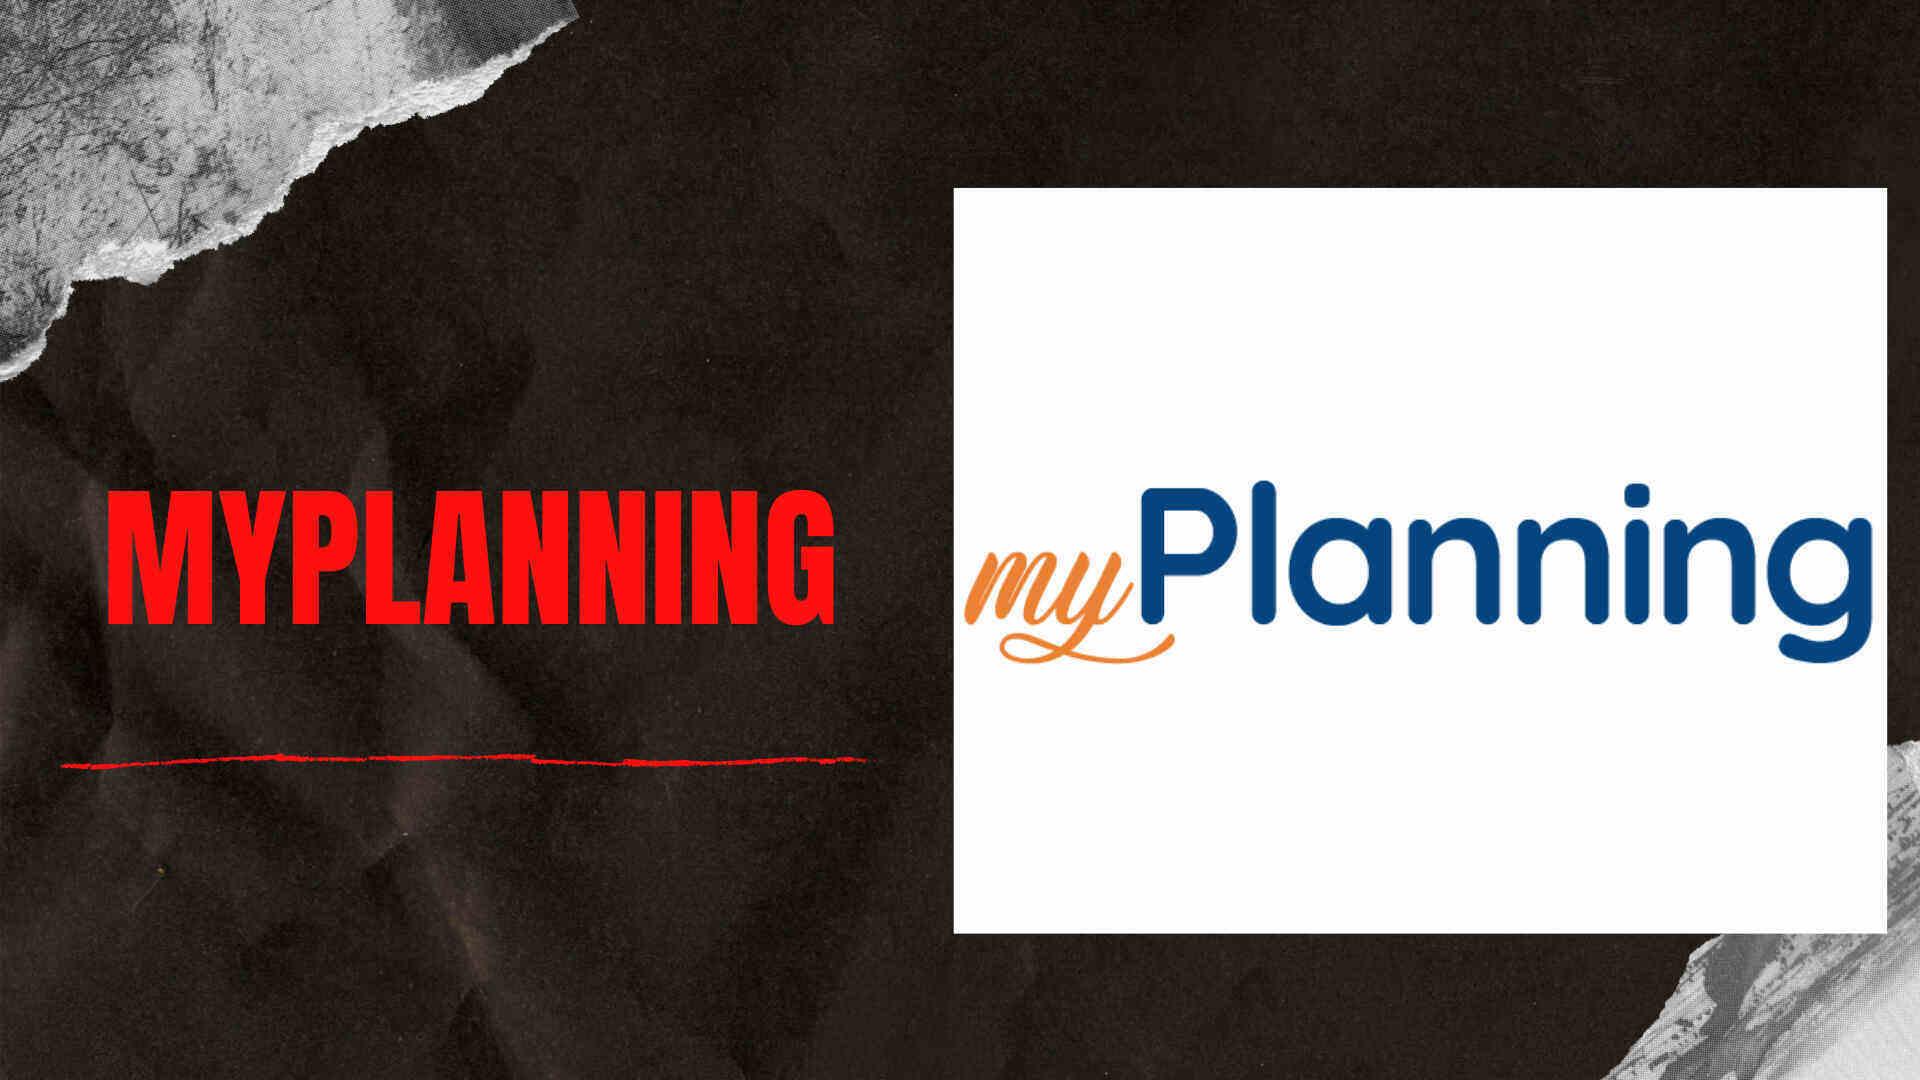 my planning